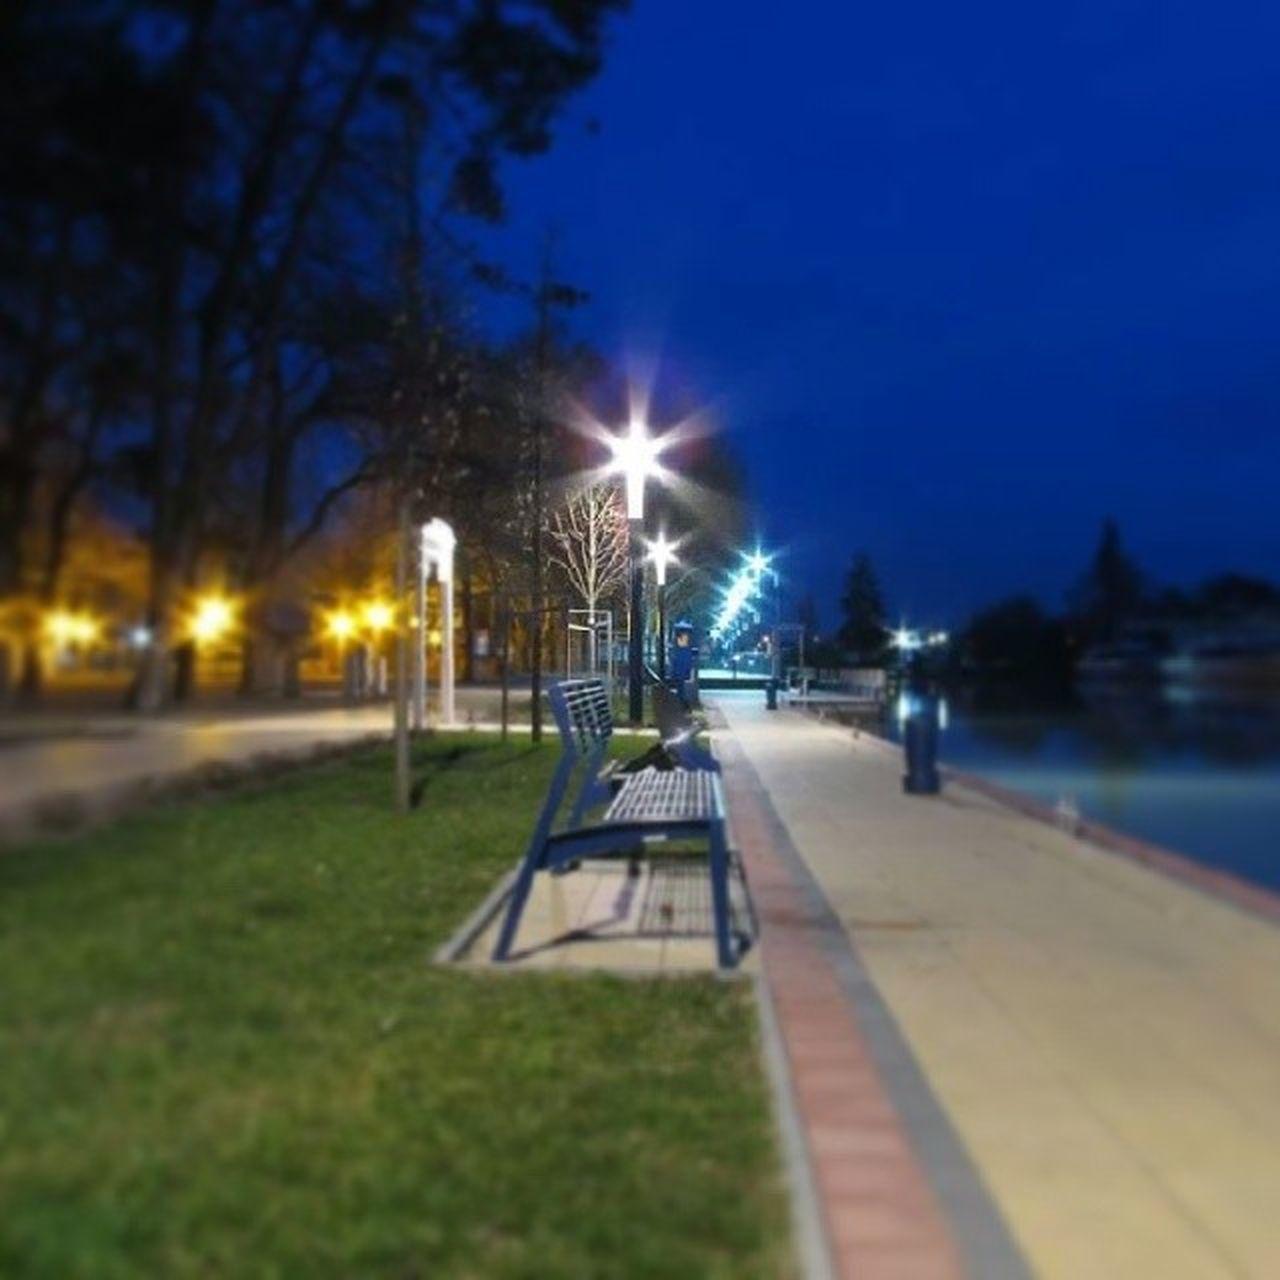 illuminated, night, lighting equipment, street light, outdoors, no people, tree, built structure, sky, grass, architecture, city, nature, building exterior